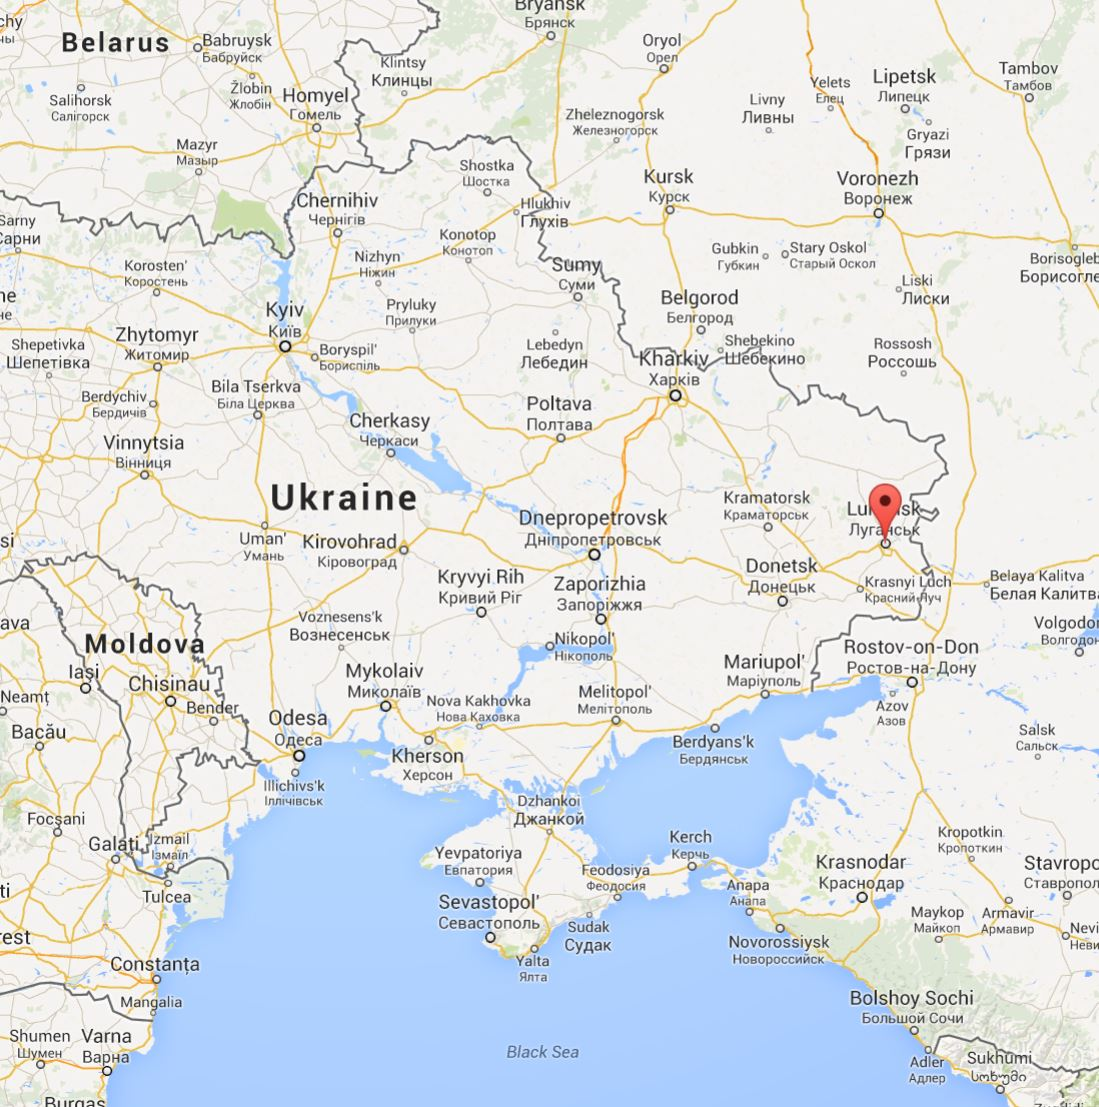 Lugansk map